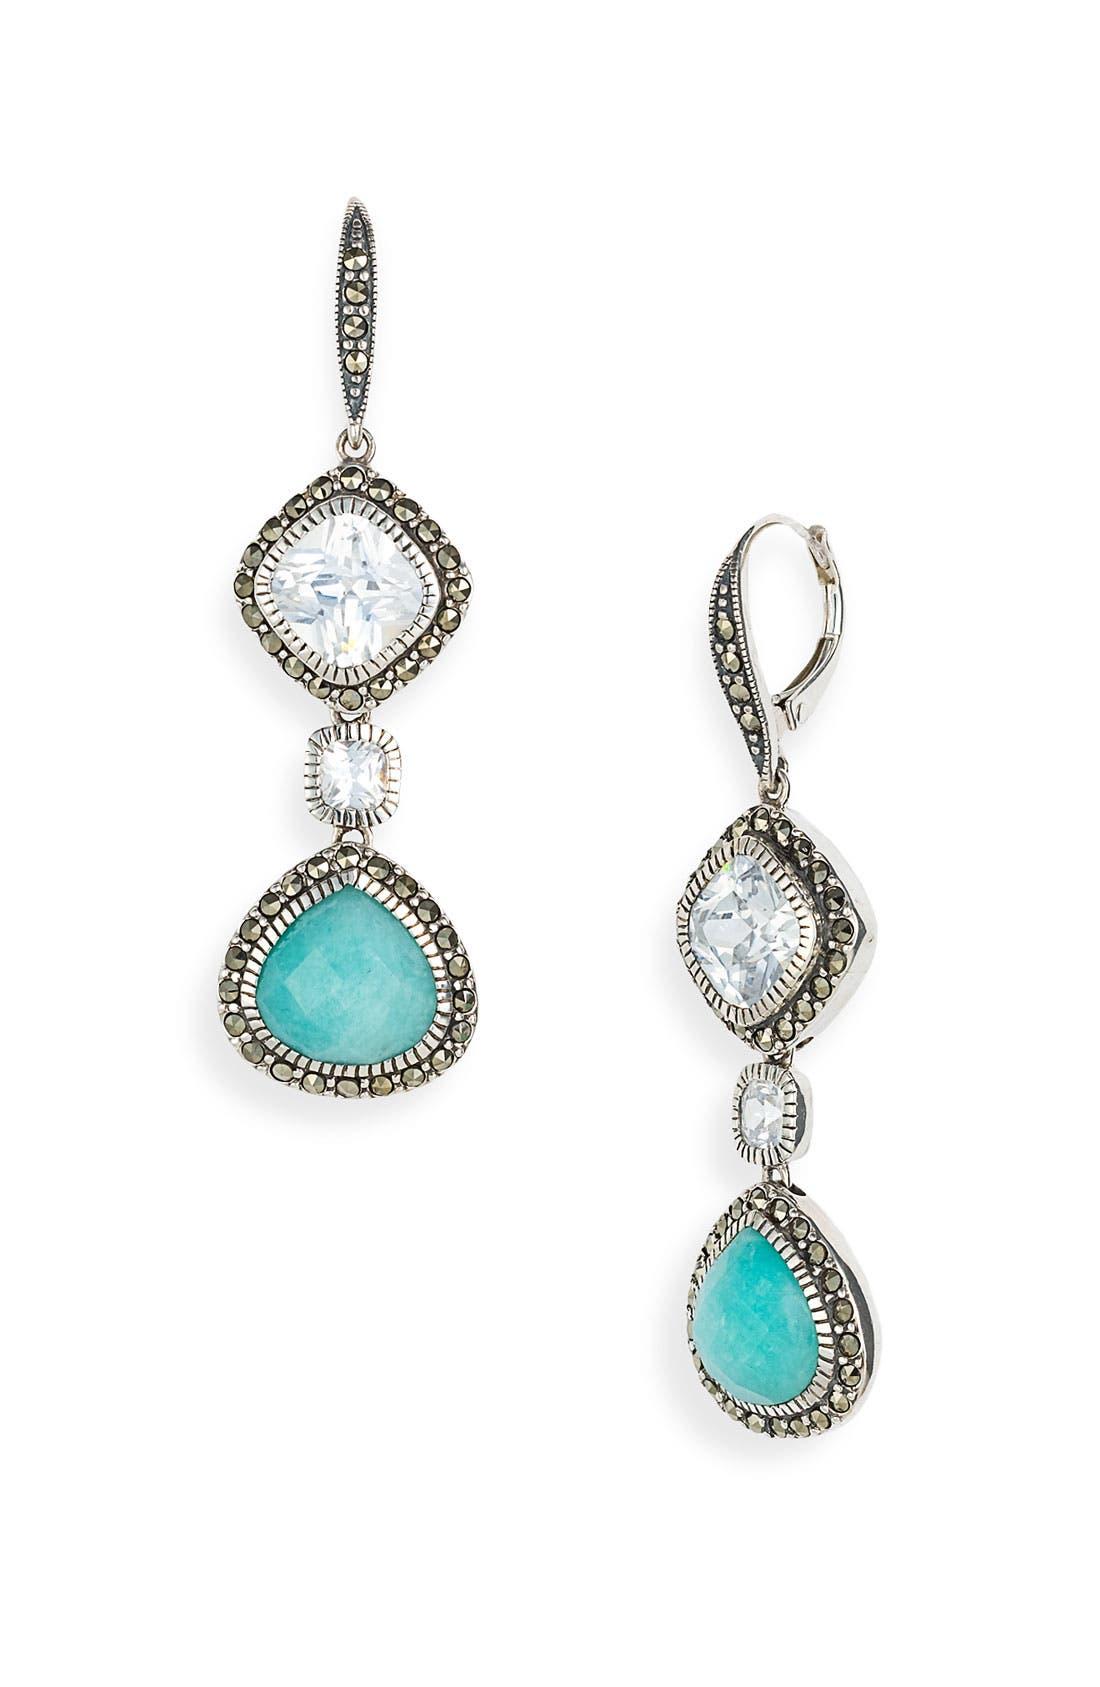 Alternate Image 1 Selected - Judith Jack 'Aquarius' Linear Drop Earrings